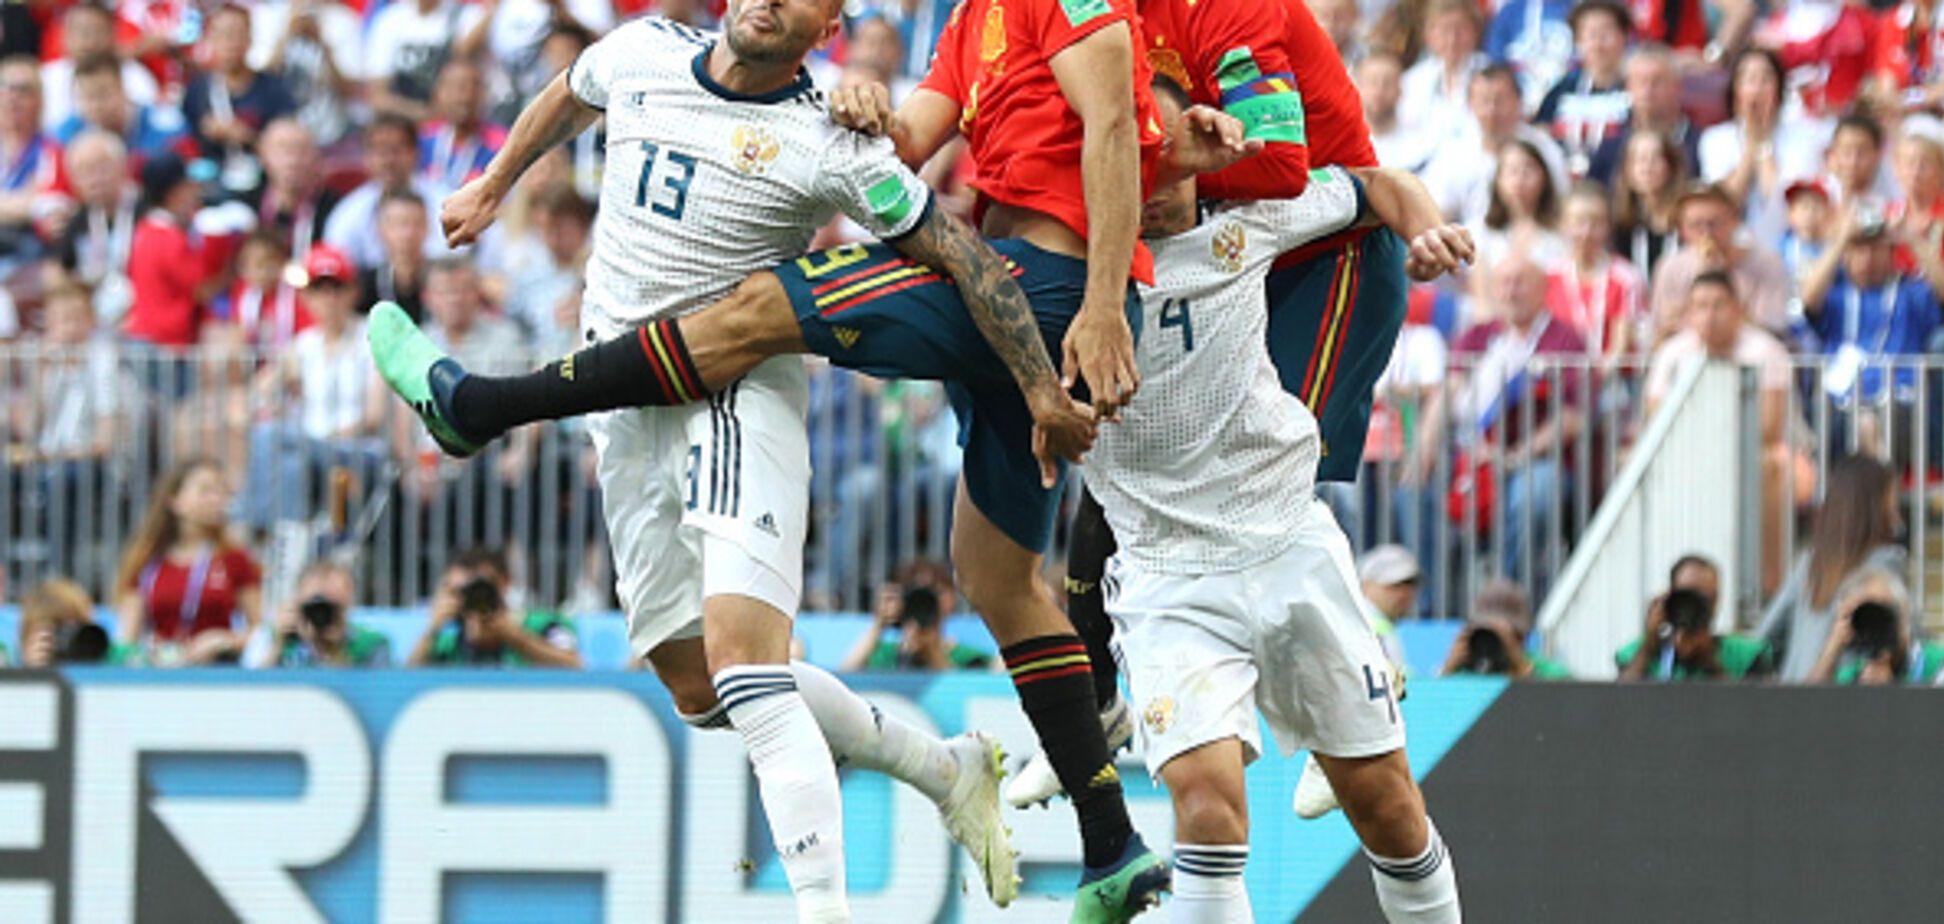 Испания установила впечатляющий рекорд в матче с Россией на ЧМ-2018